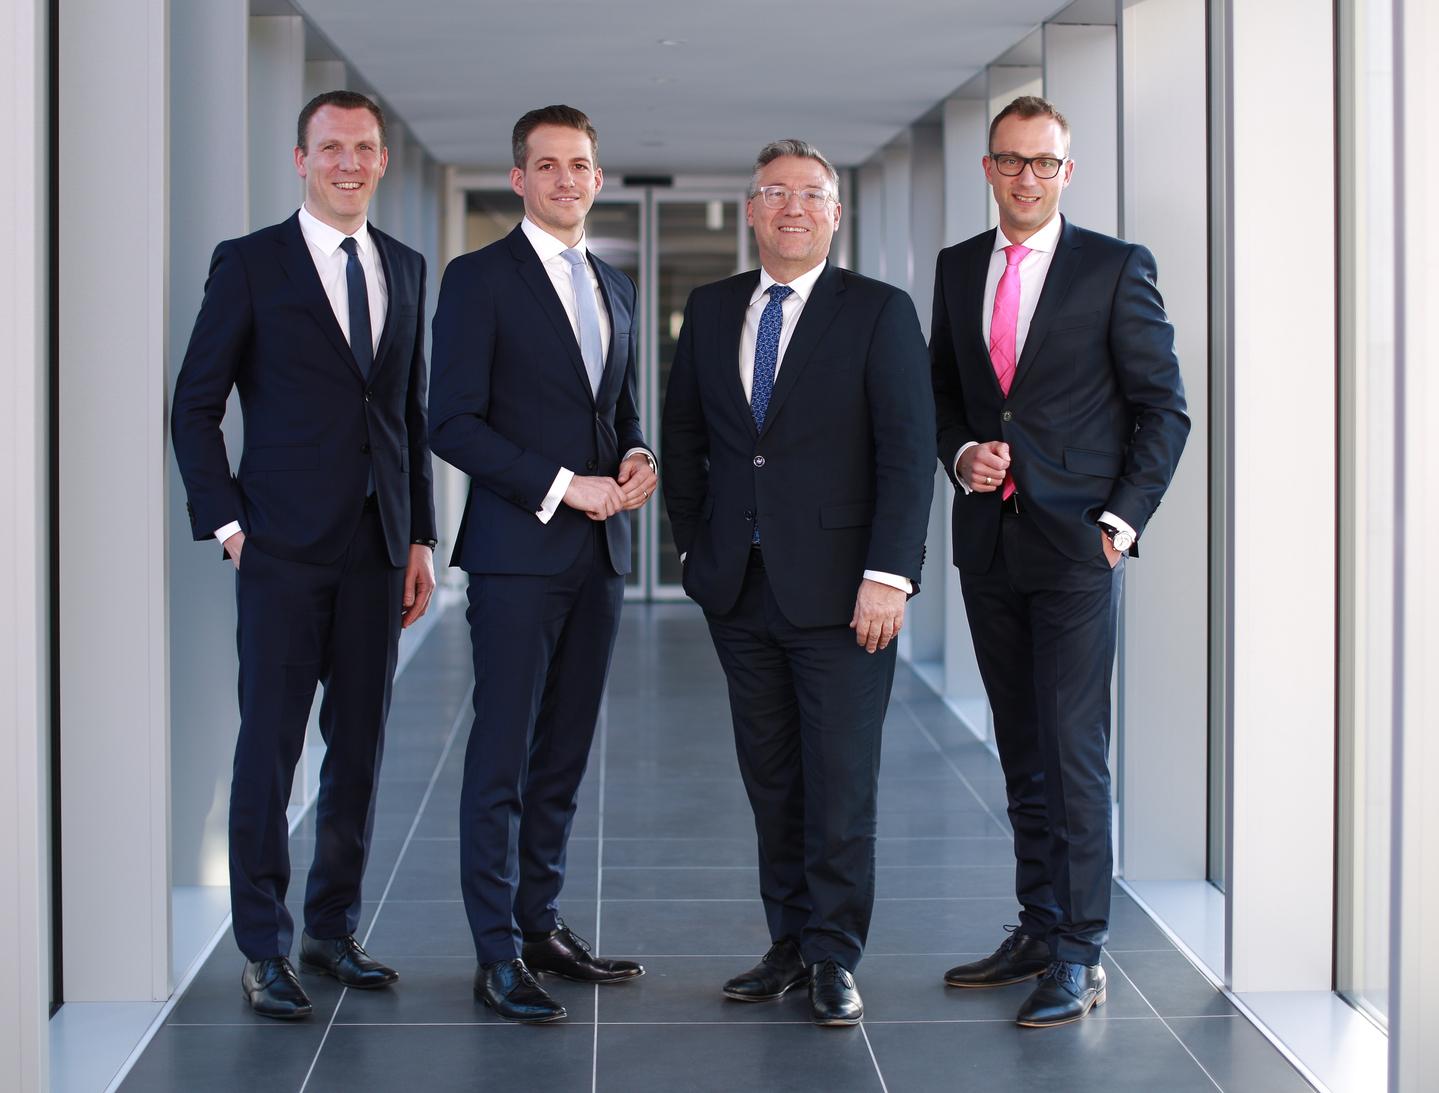 Vier Fuhrungskrafte Der Vr Bank Sudpfalz Zu Prokuristen Ernannt Pfalz Express